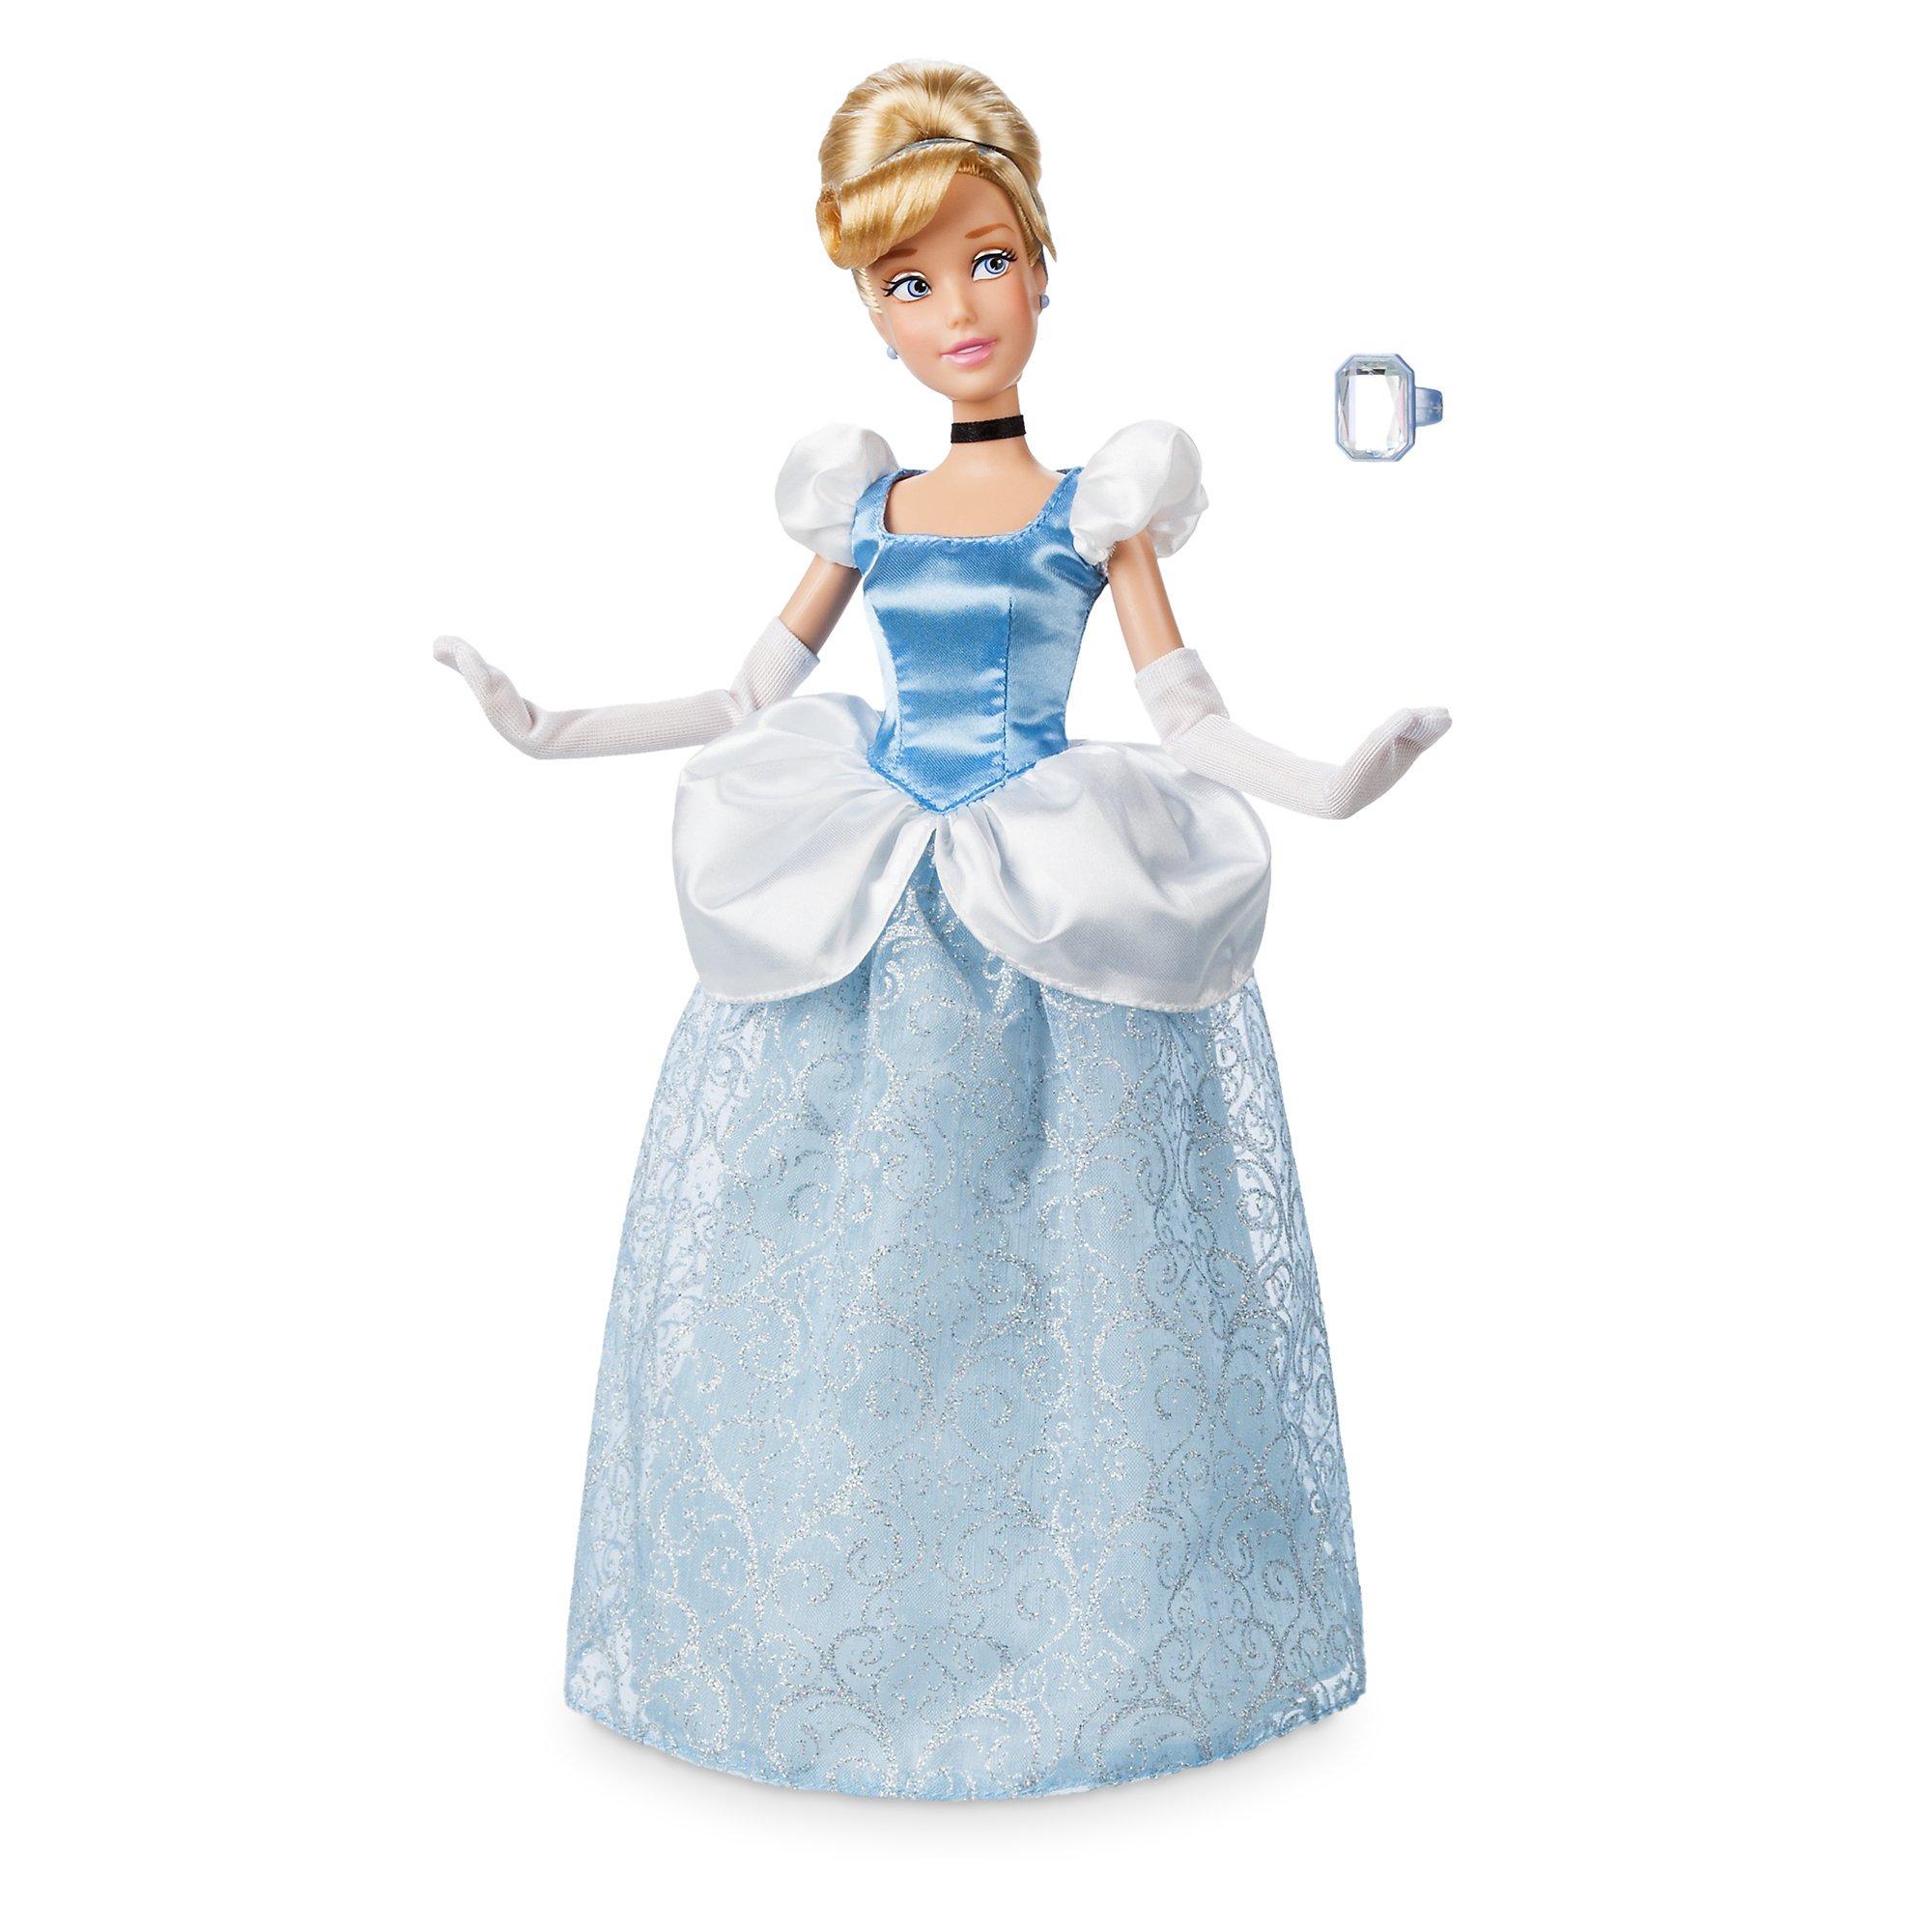 Disney Store Princess Cinderella Classic Doll w// Gus Girls Poseable Figure Toy